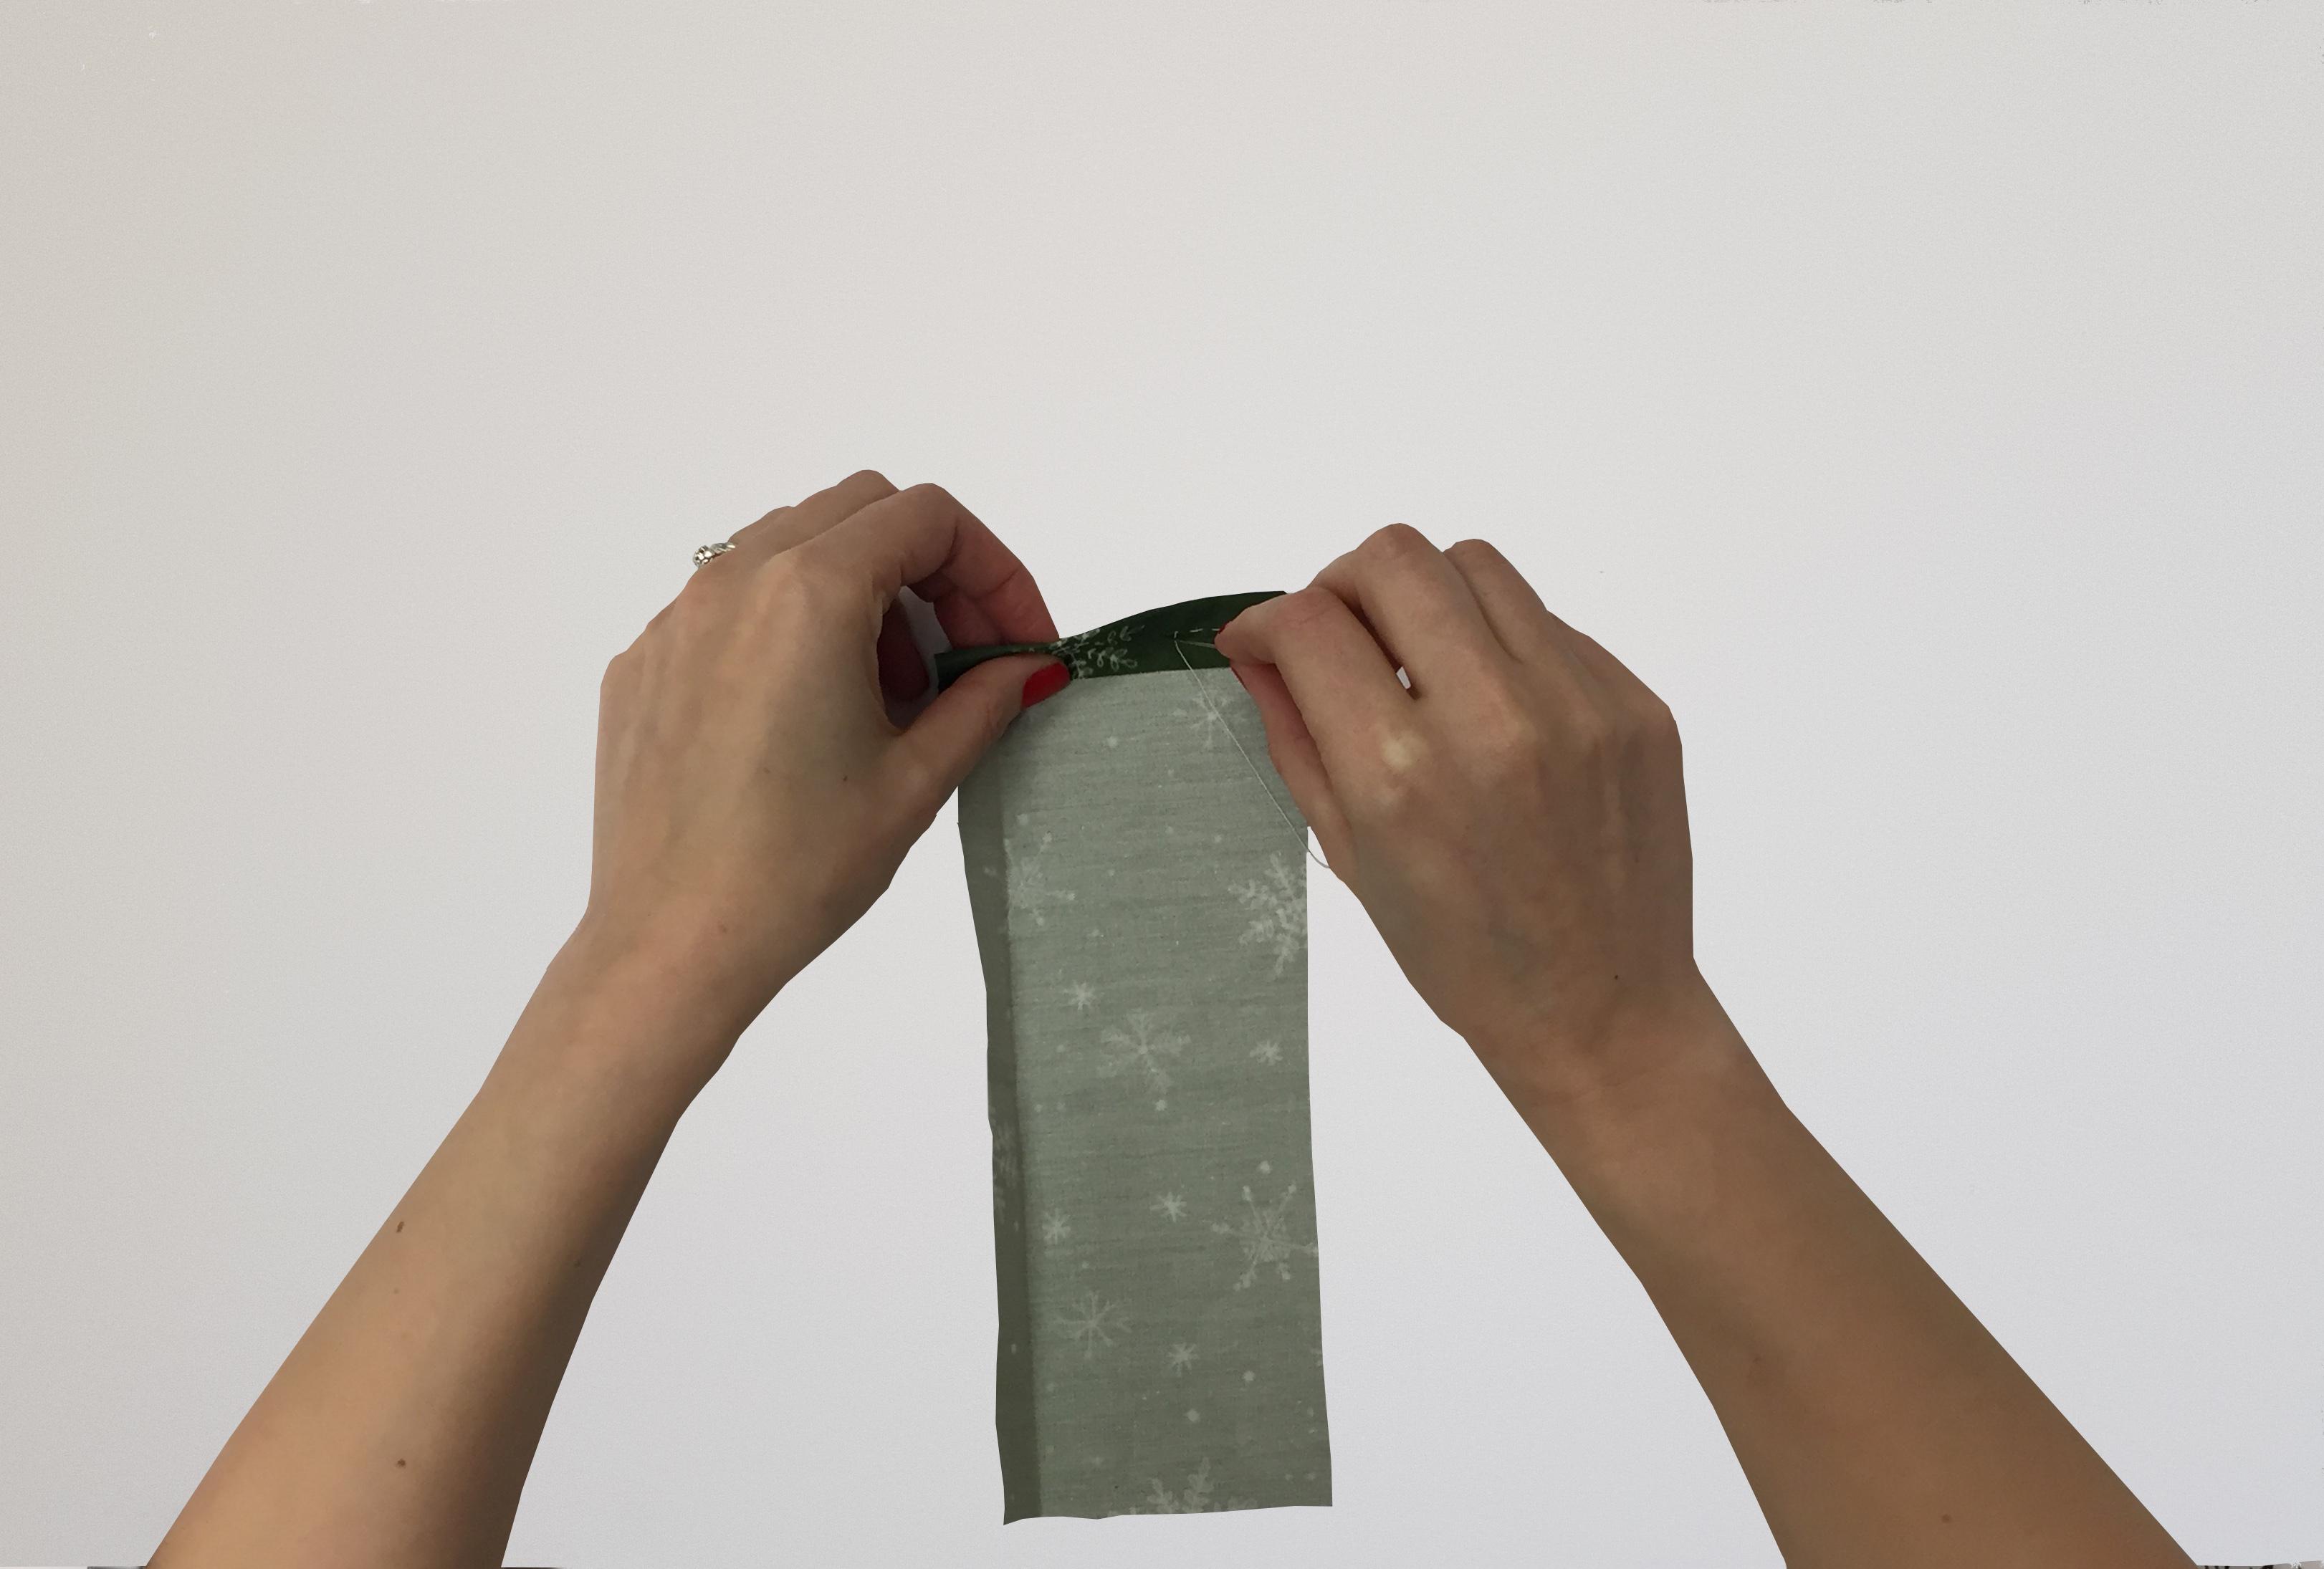 DIY Advent Calendar - Sewing Each Bag